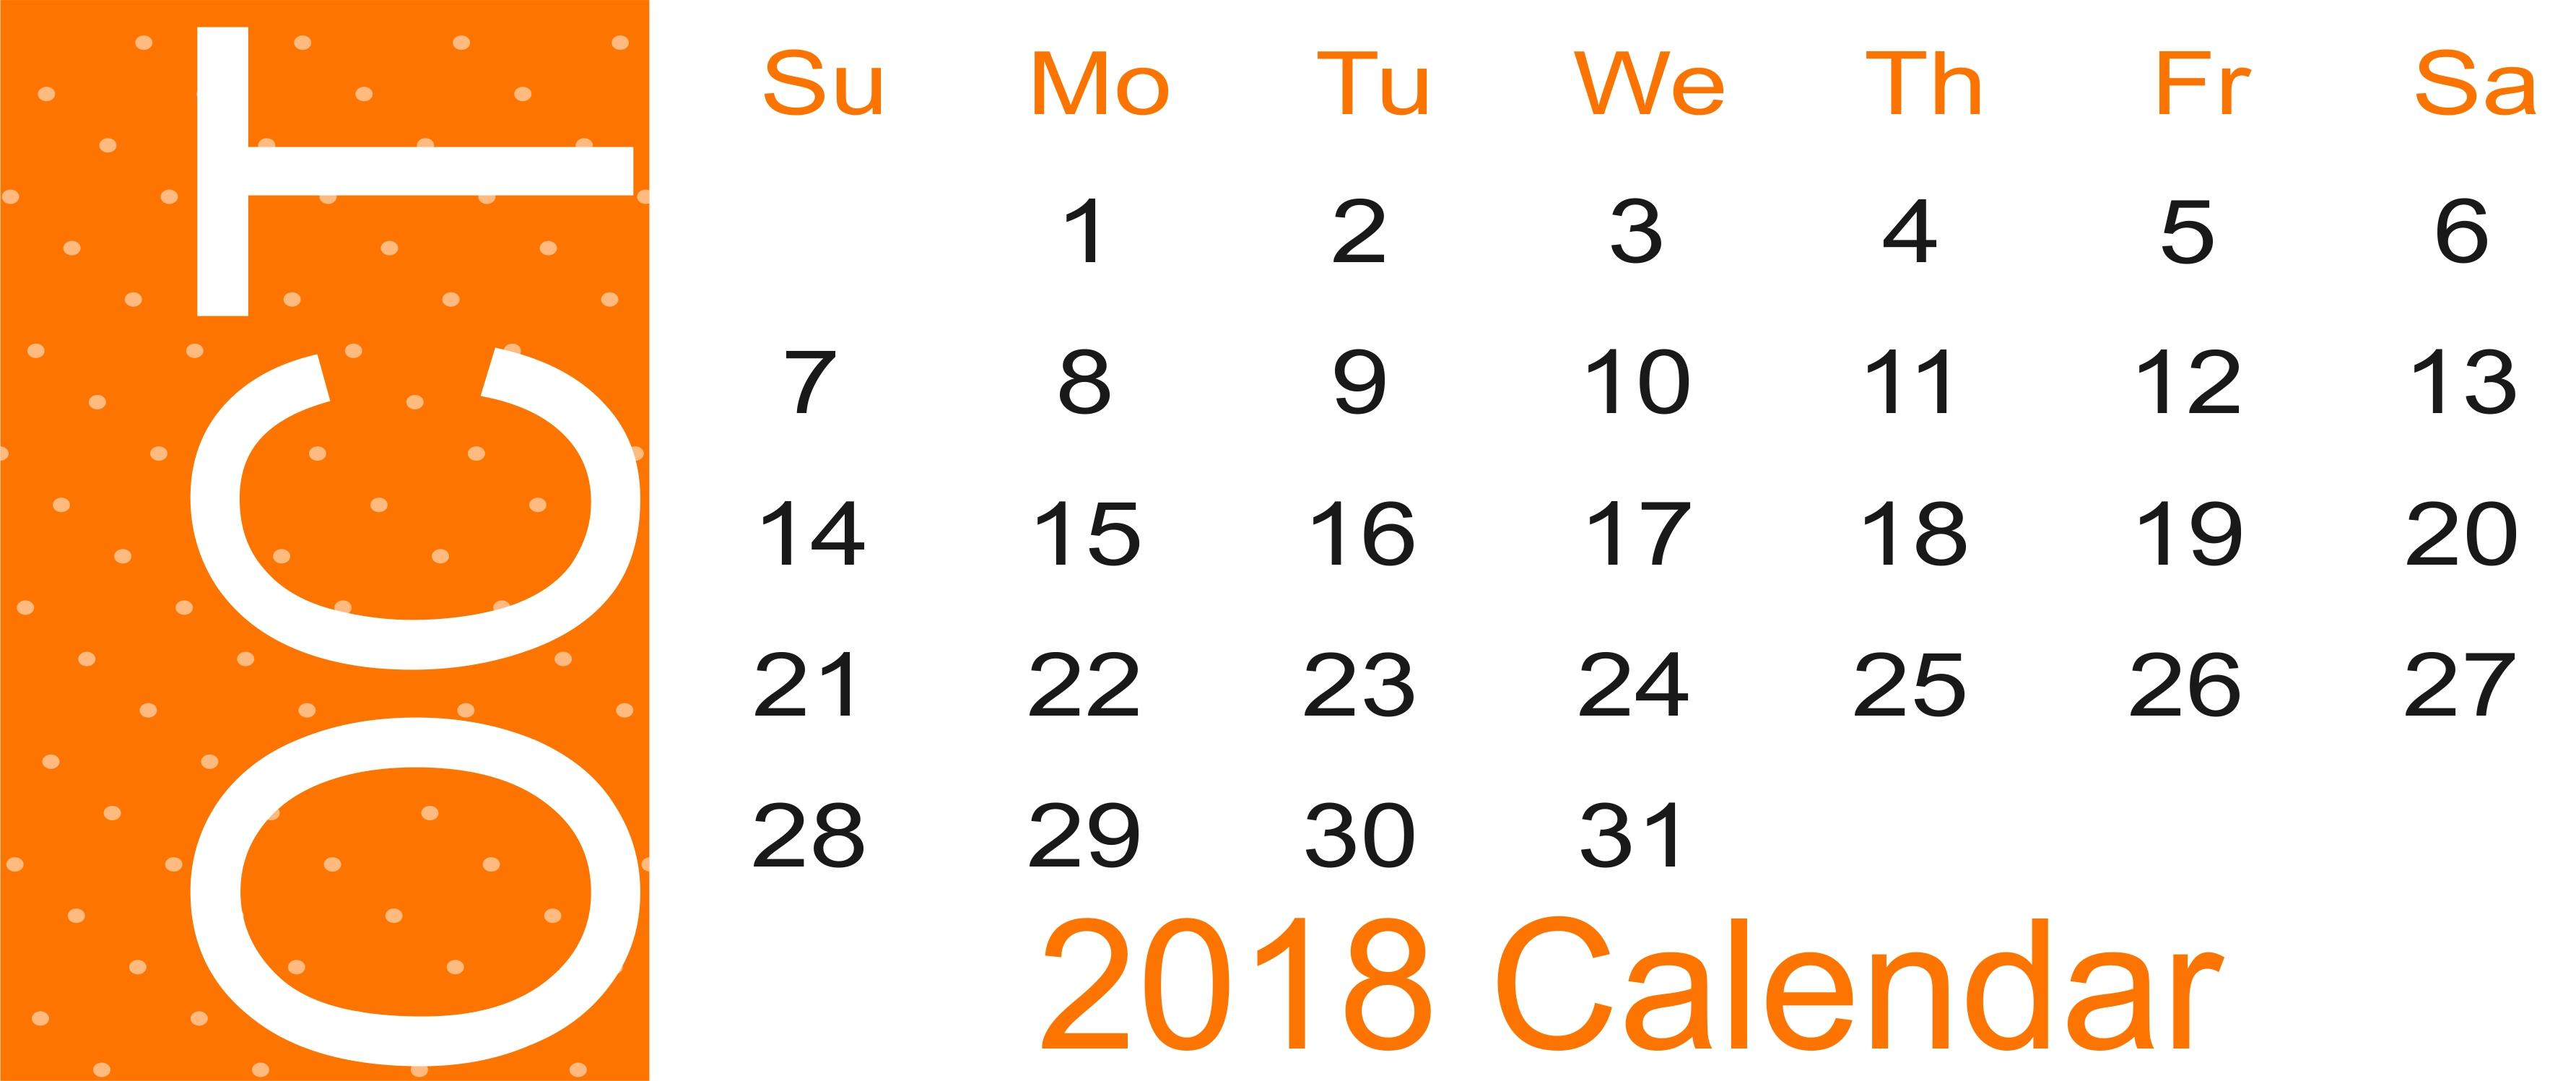 october 2018 calendar october 2018 printable calendar october October 2018 Calendar Free erdferdf